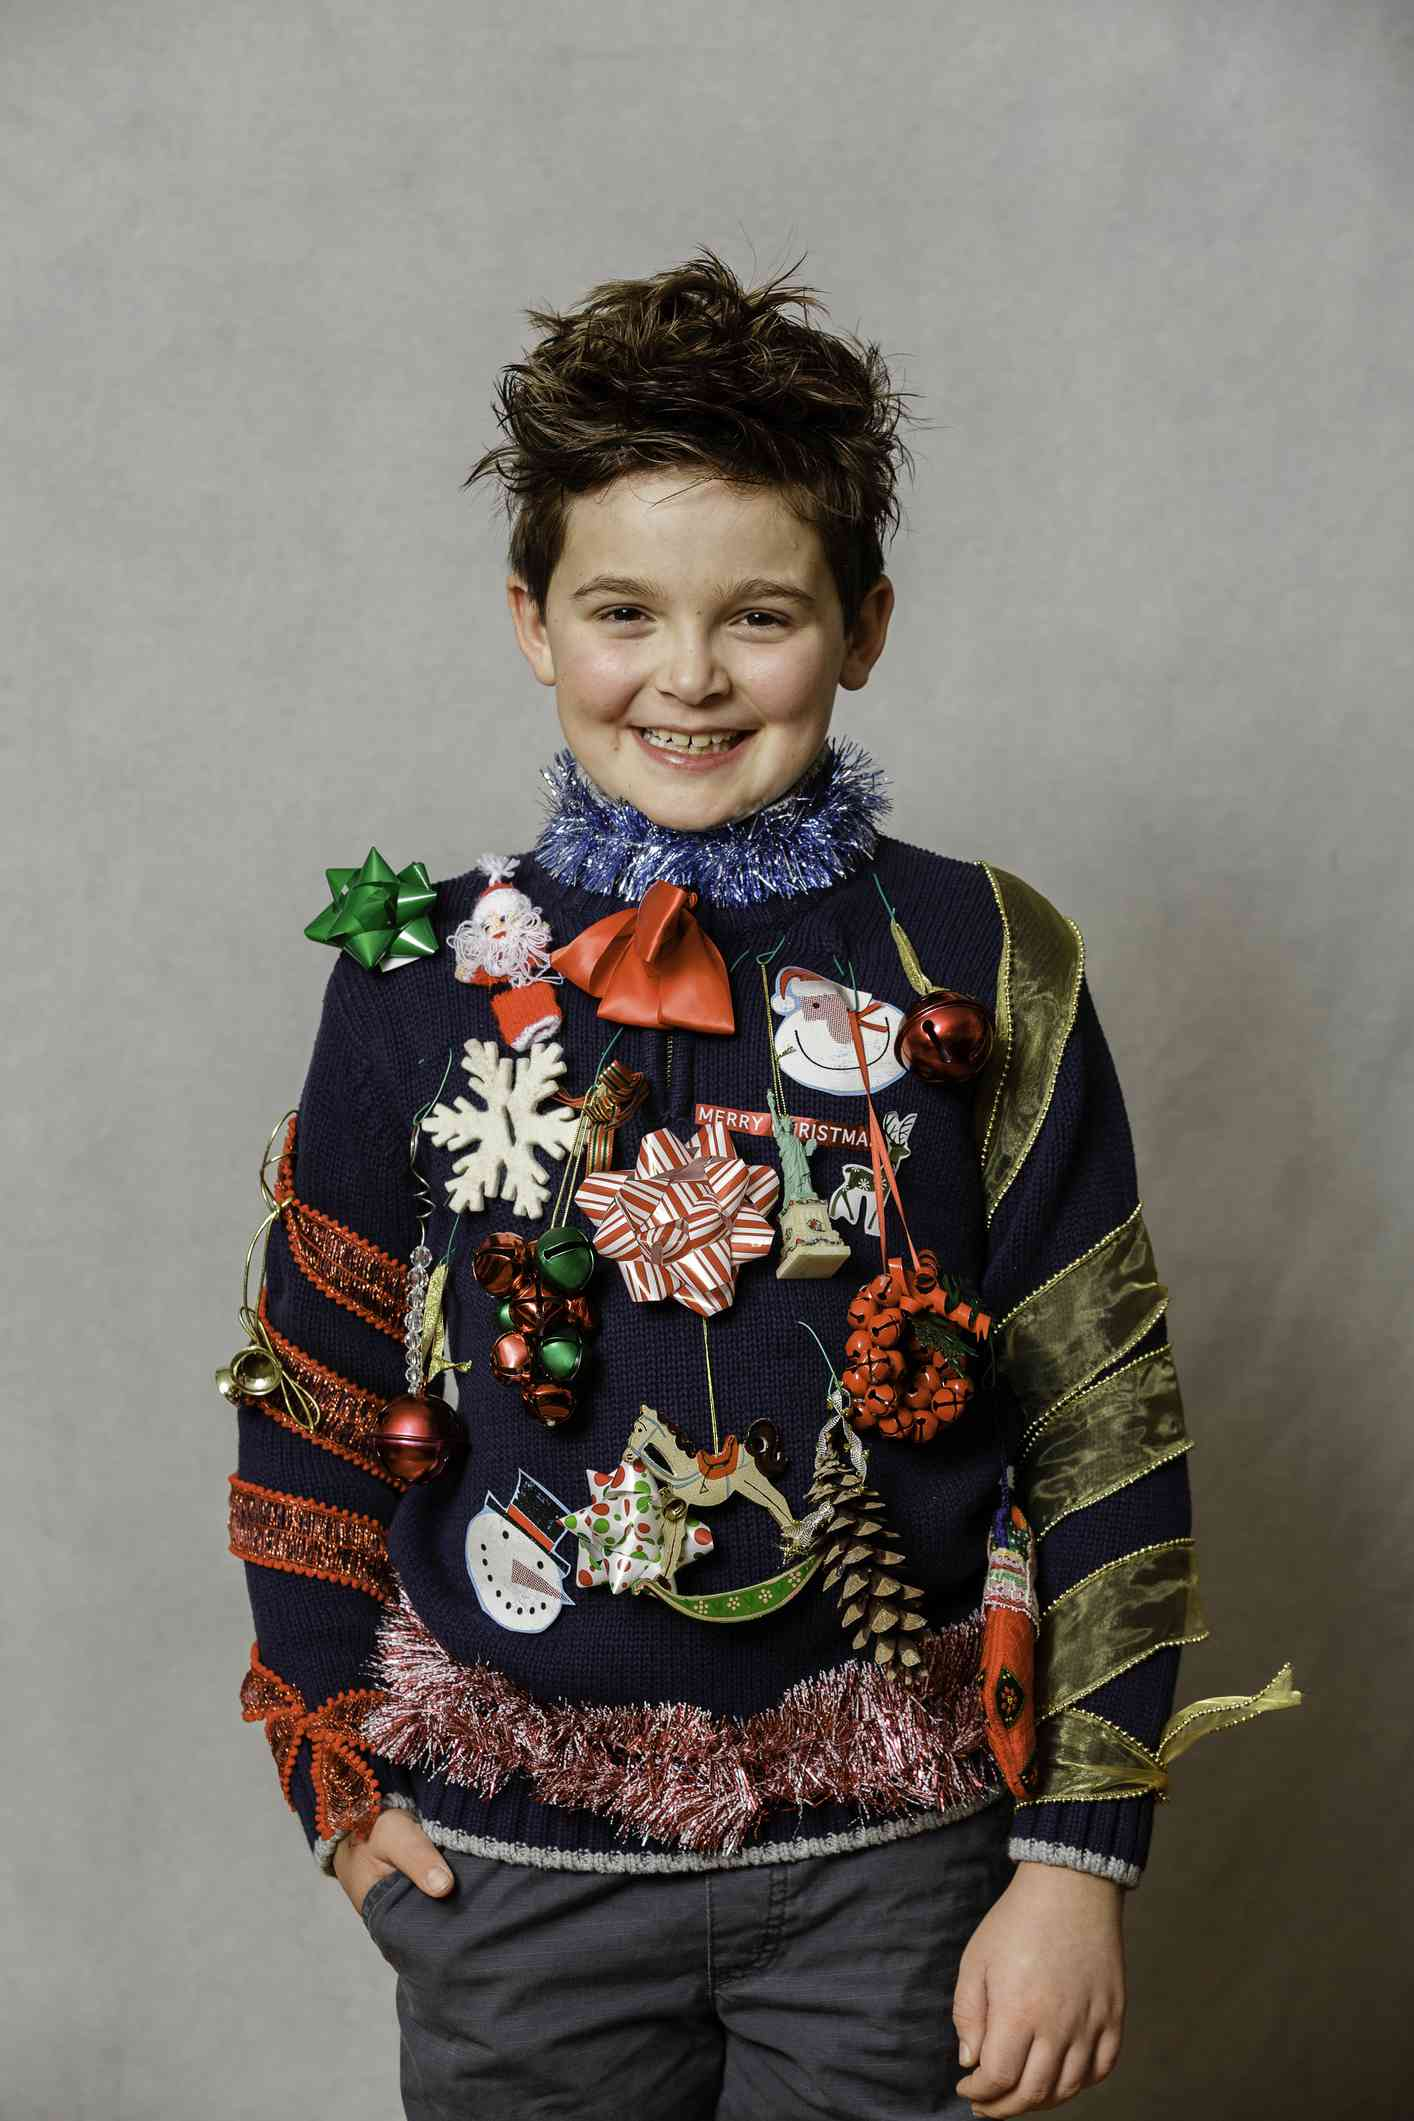 An ugly Christmas Sweater